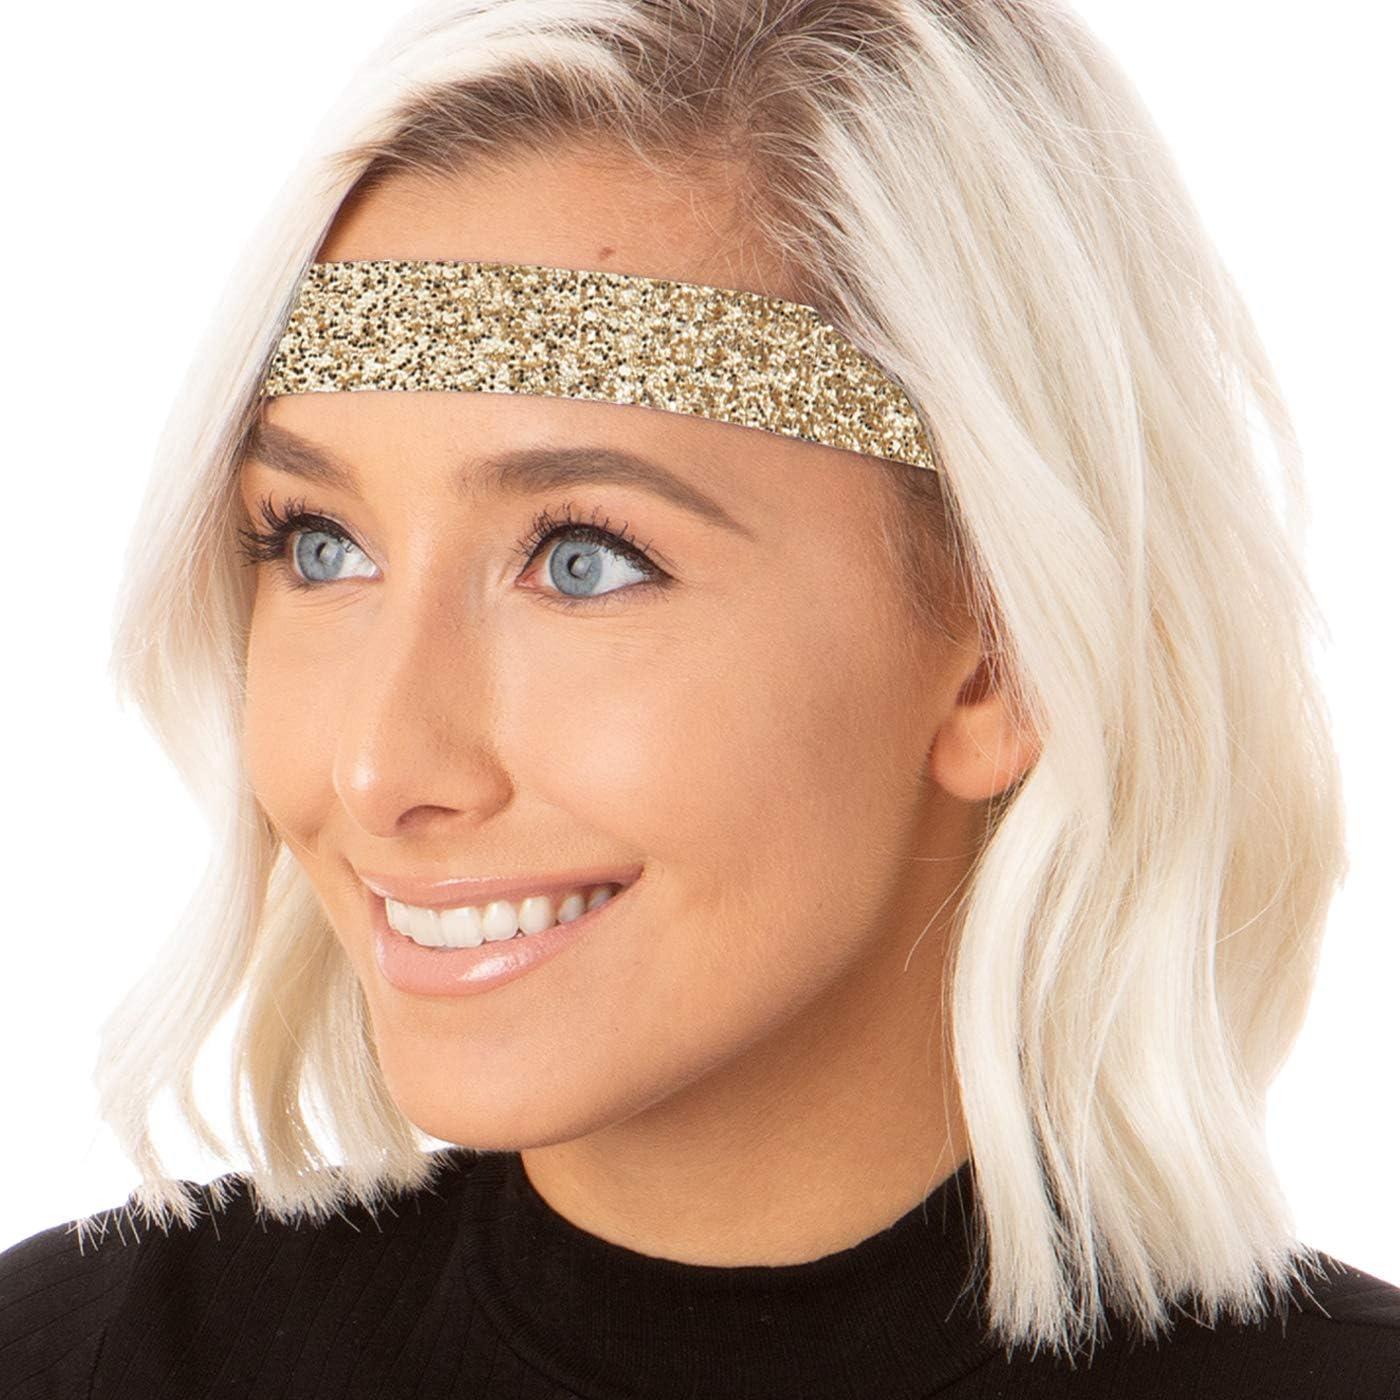 Hipsy Petite Size, Adjustable No Slip Sparkly Wide Bling Glitter Headbands for Women Girls & Teens